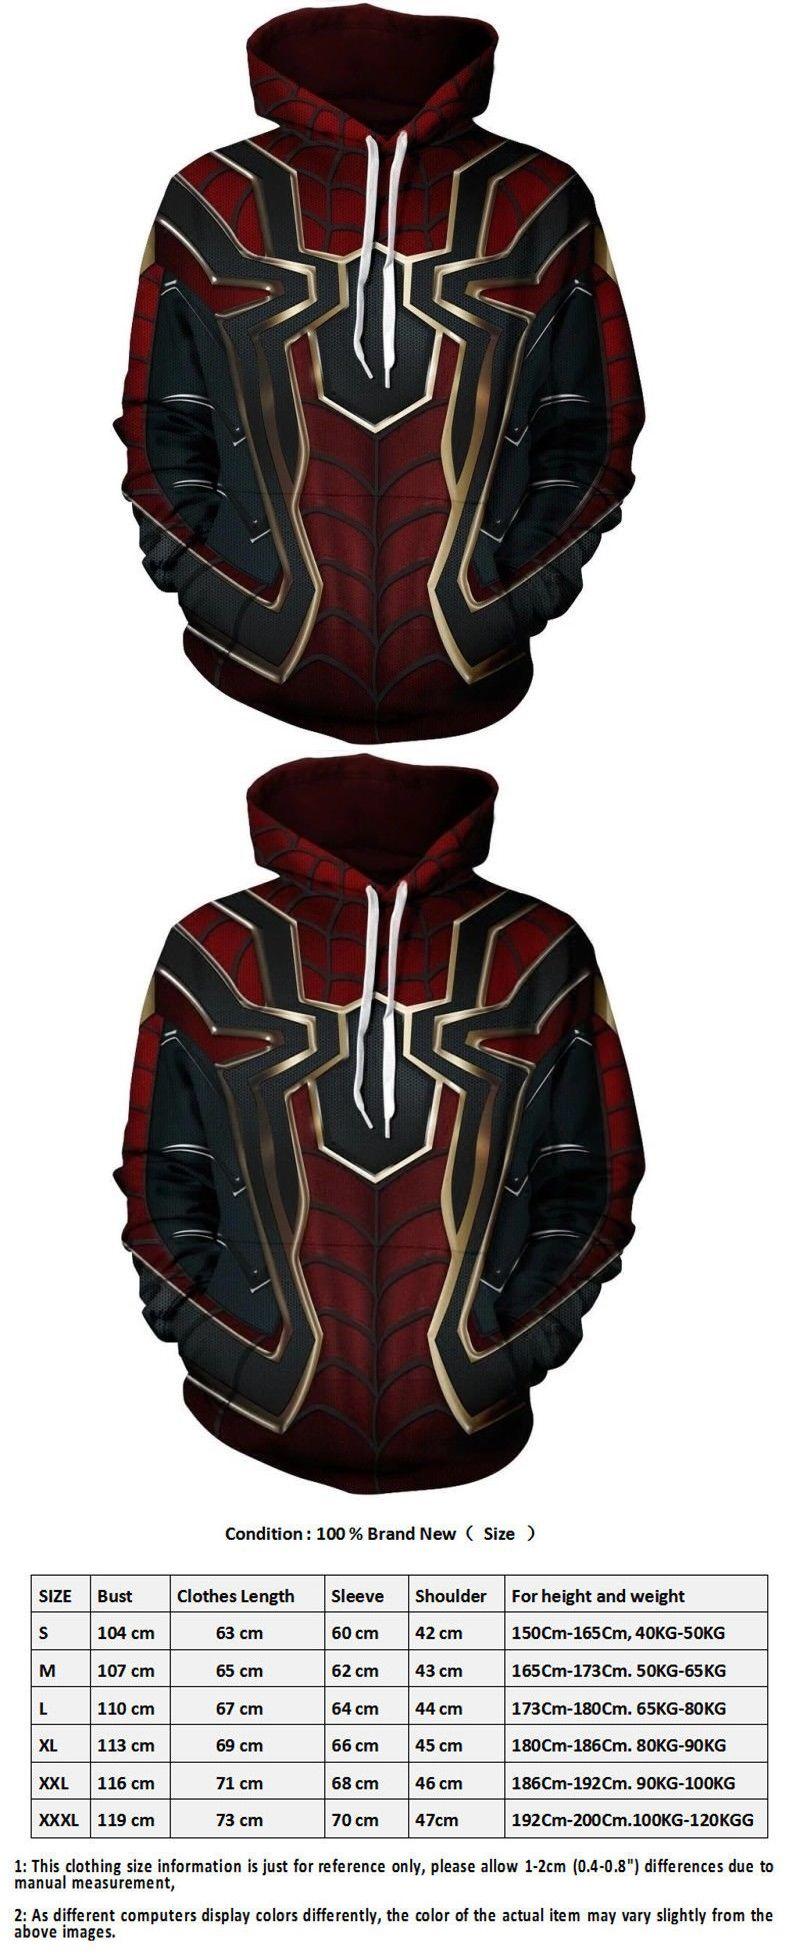 bb3e67c4 Men 52762: Avengers Infinity War Spiderman Sweater Hoodie Iron Spider Coat  Cosplay Costume -> BUY IT NOW ONLY: $22.99 on #eBay #avengers #infinity ...